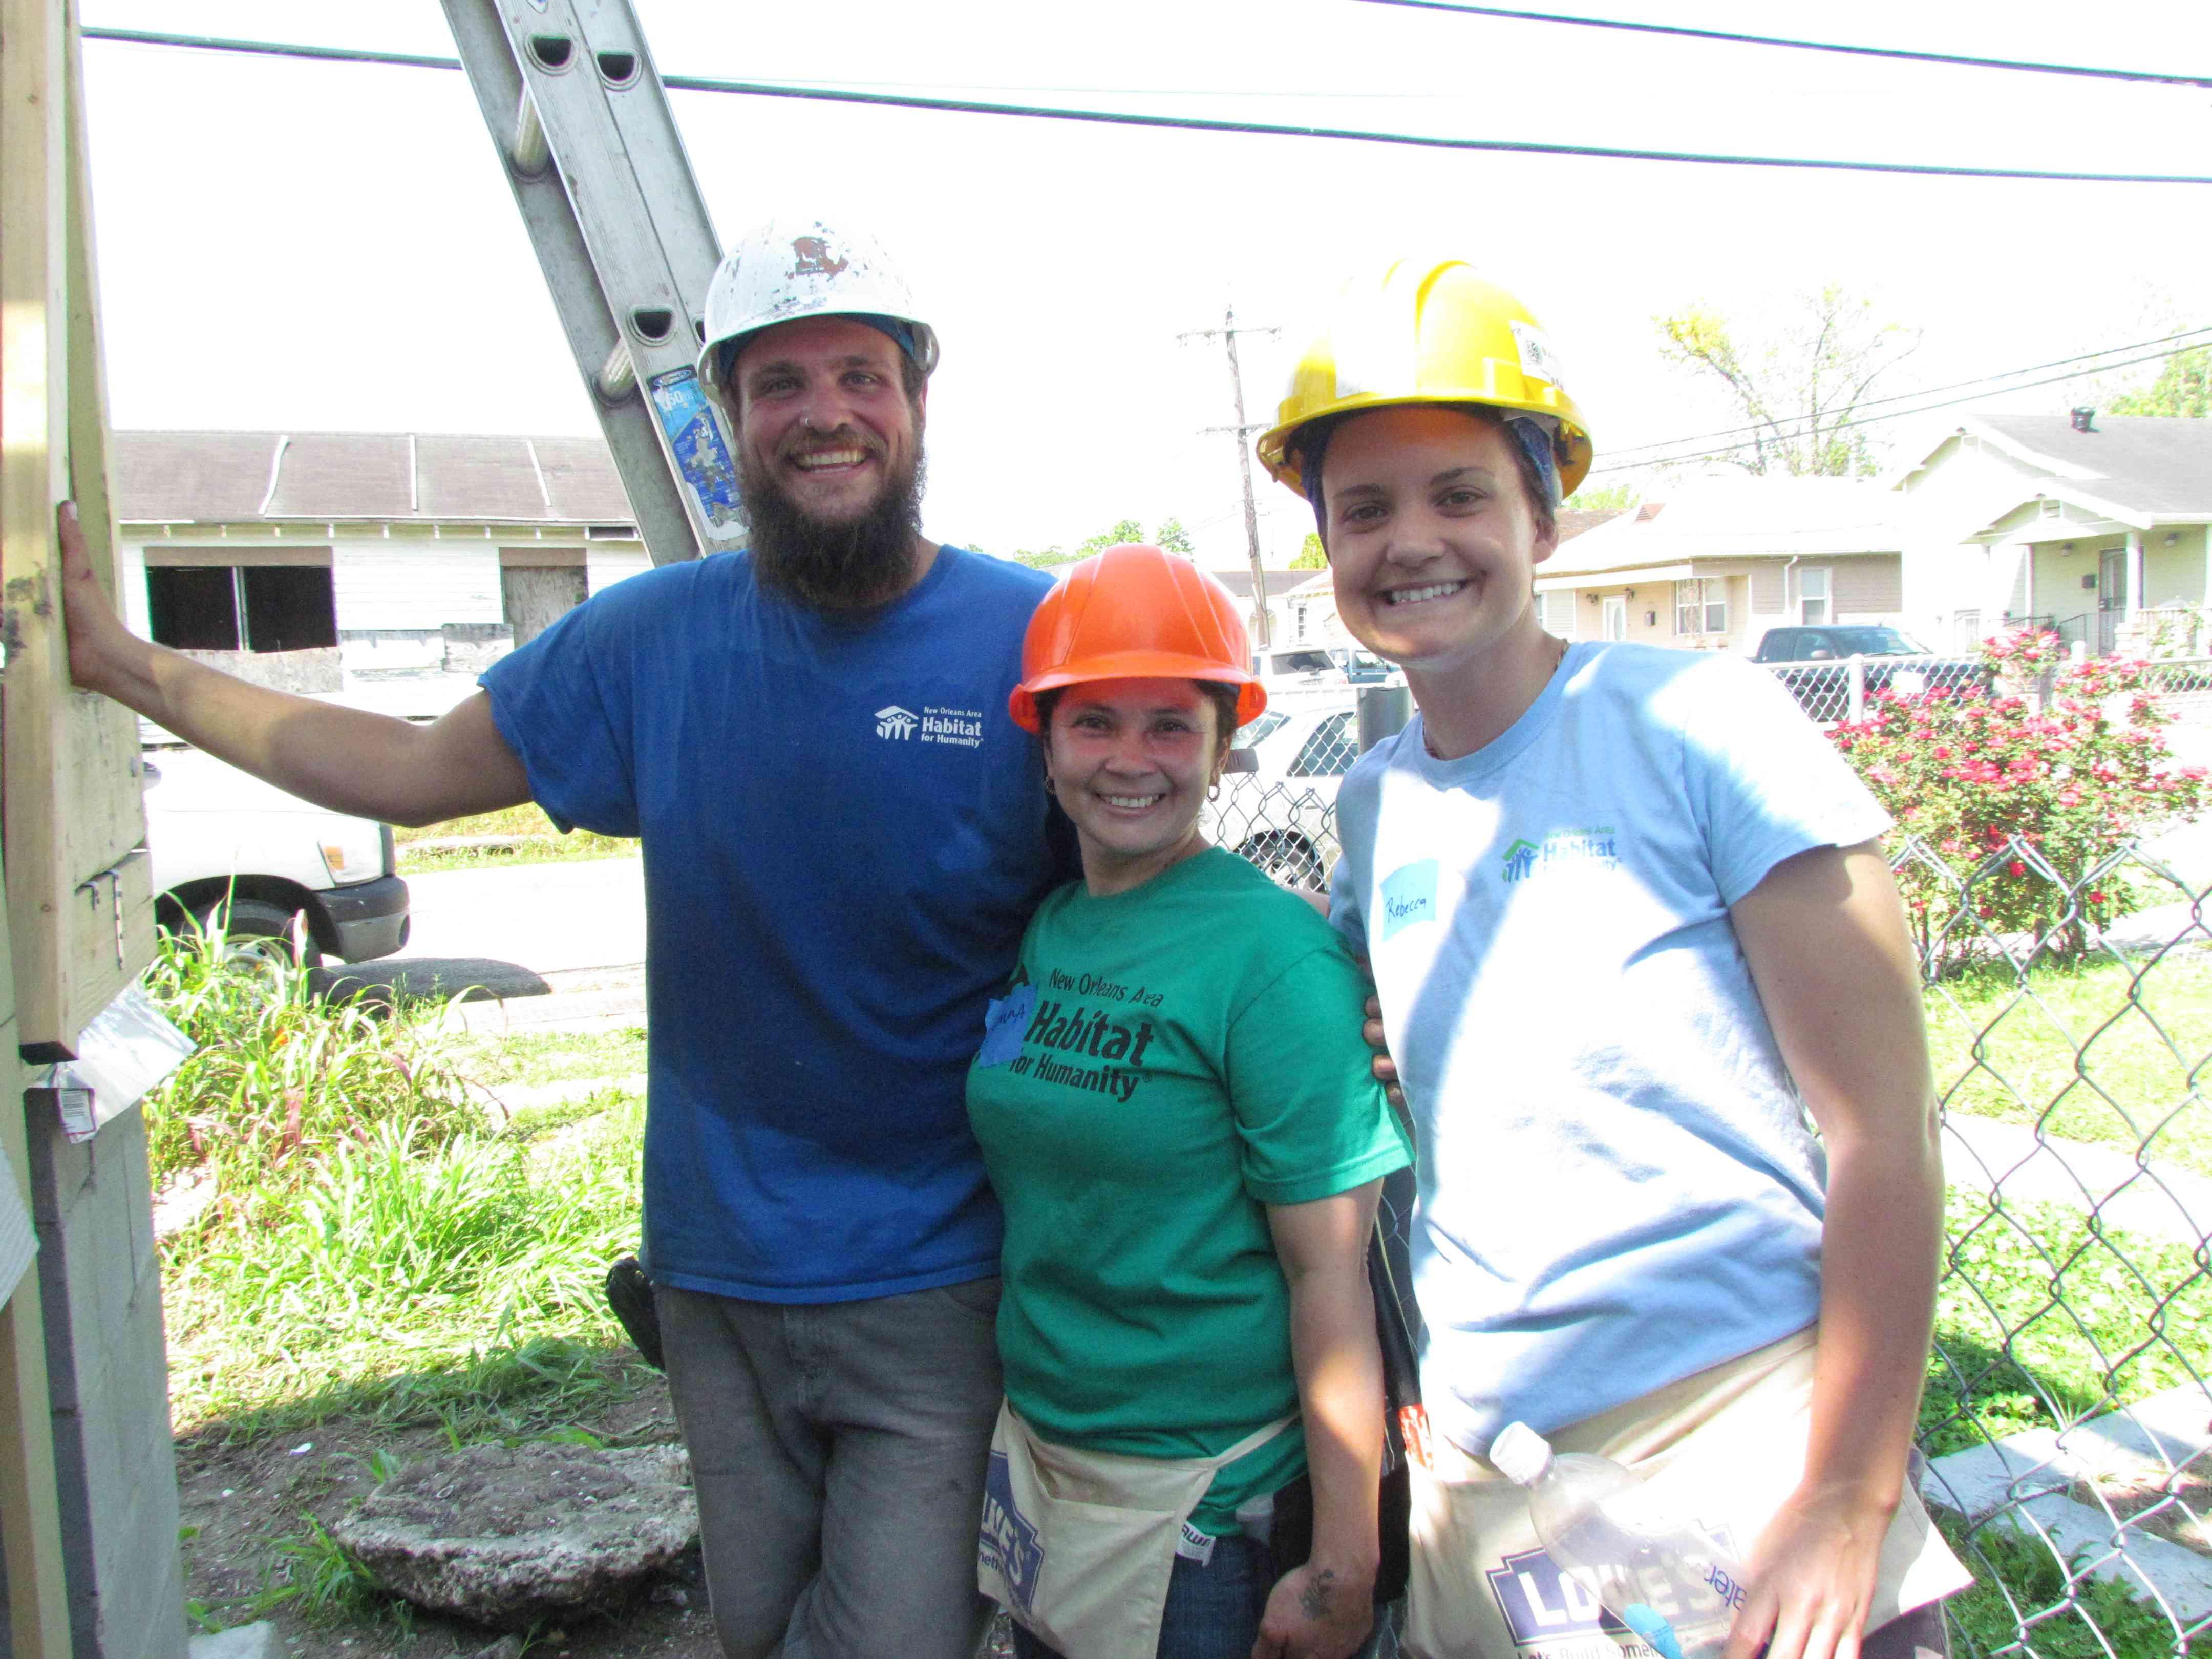 Volunteer Profile: Greg Beuerman and My Pledge 2015 - New Orleans Area Habitat For Humanity